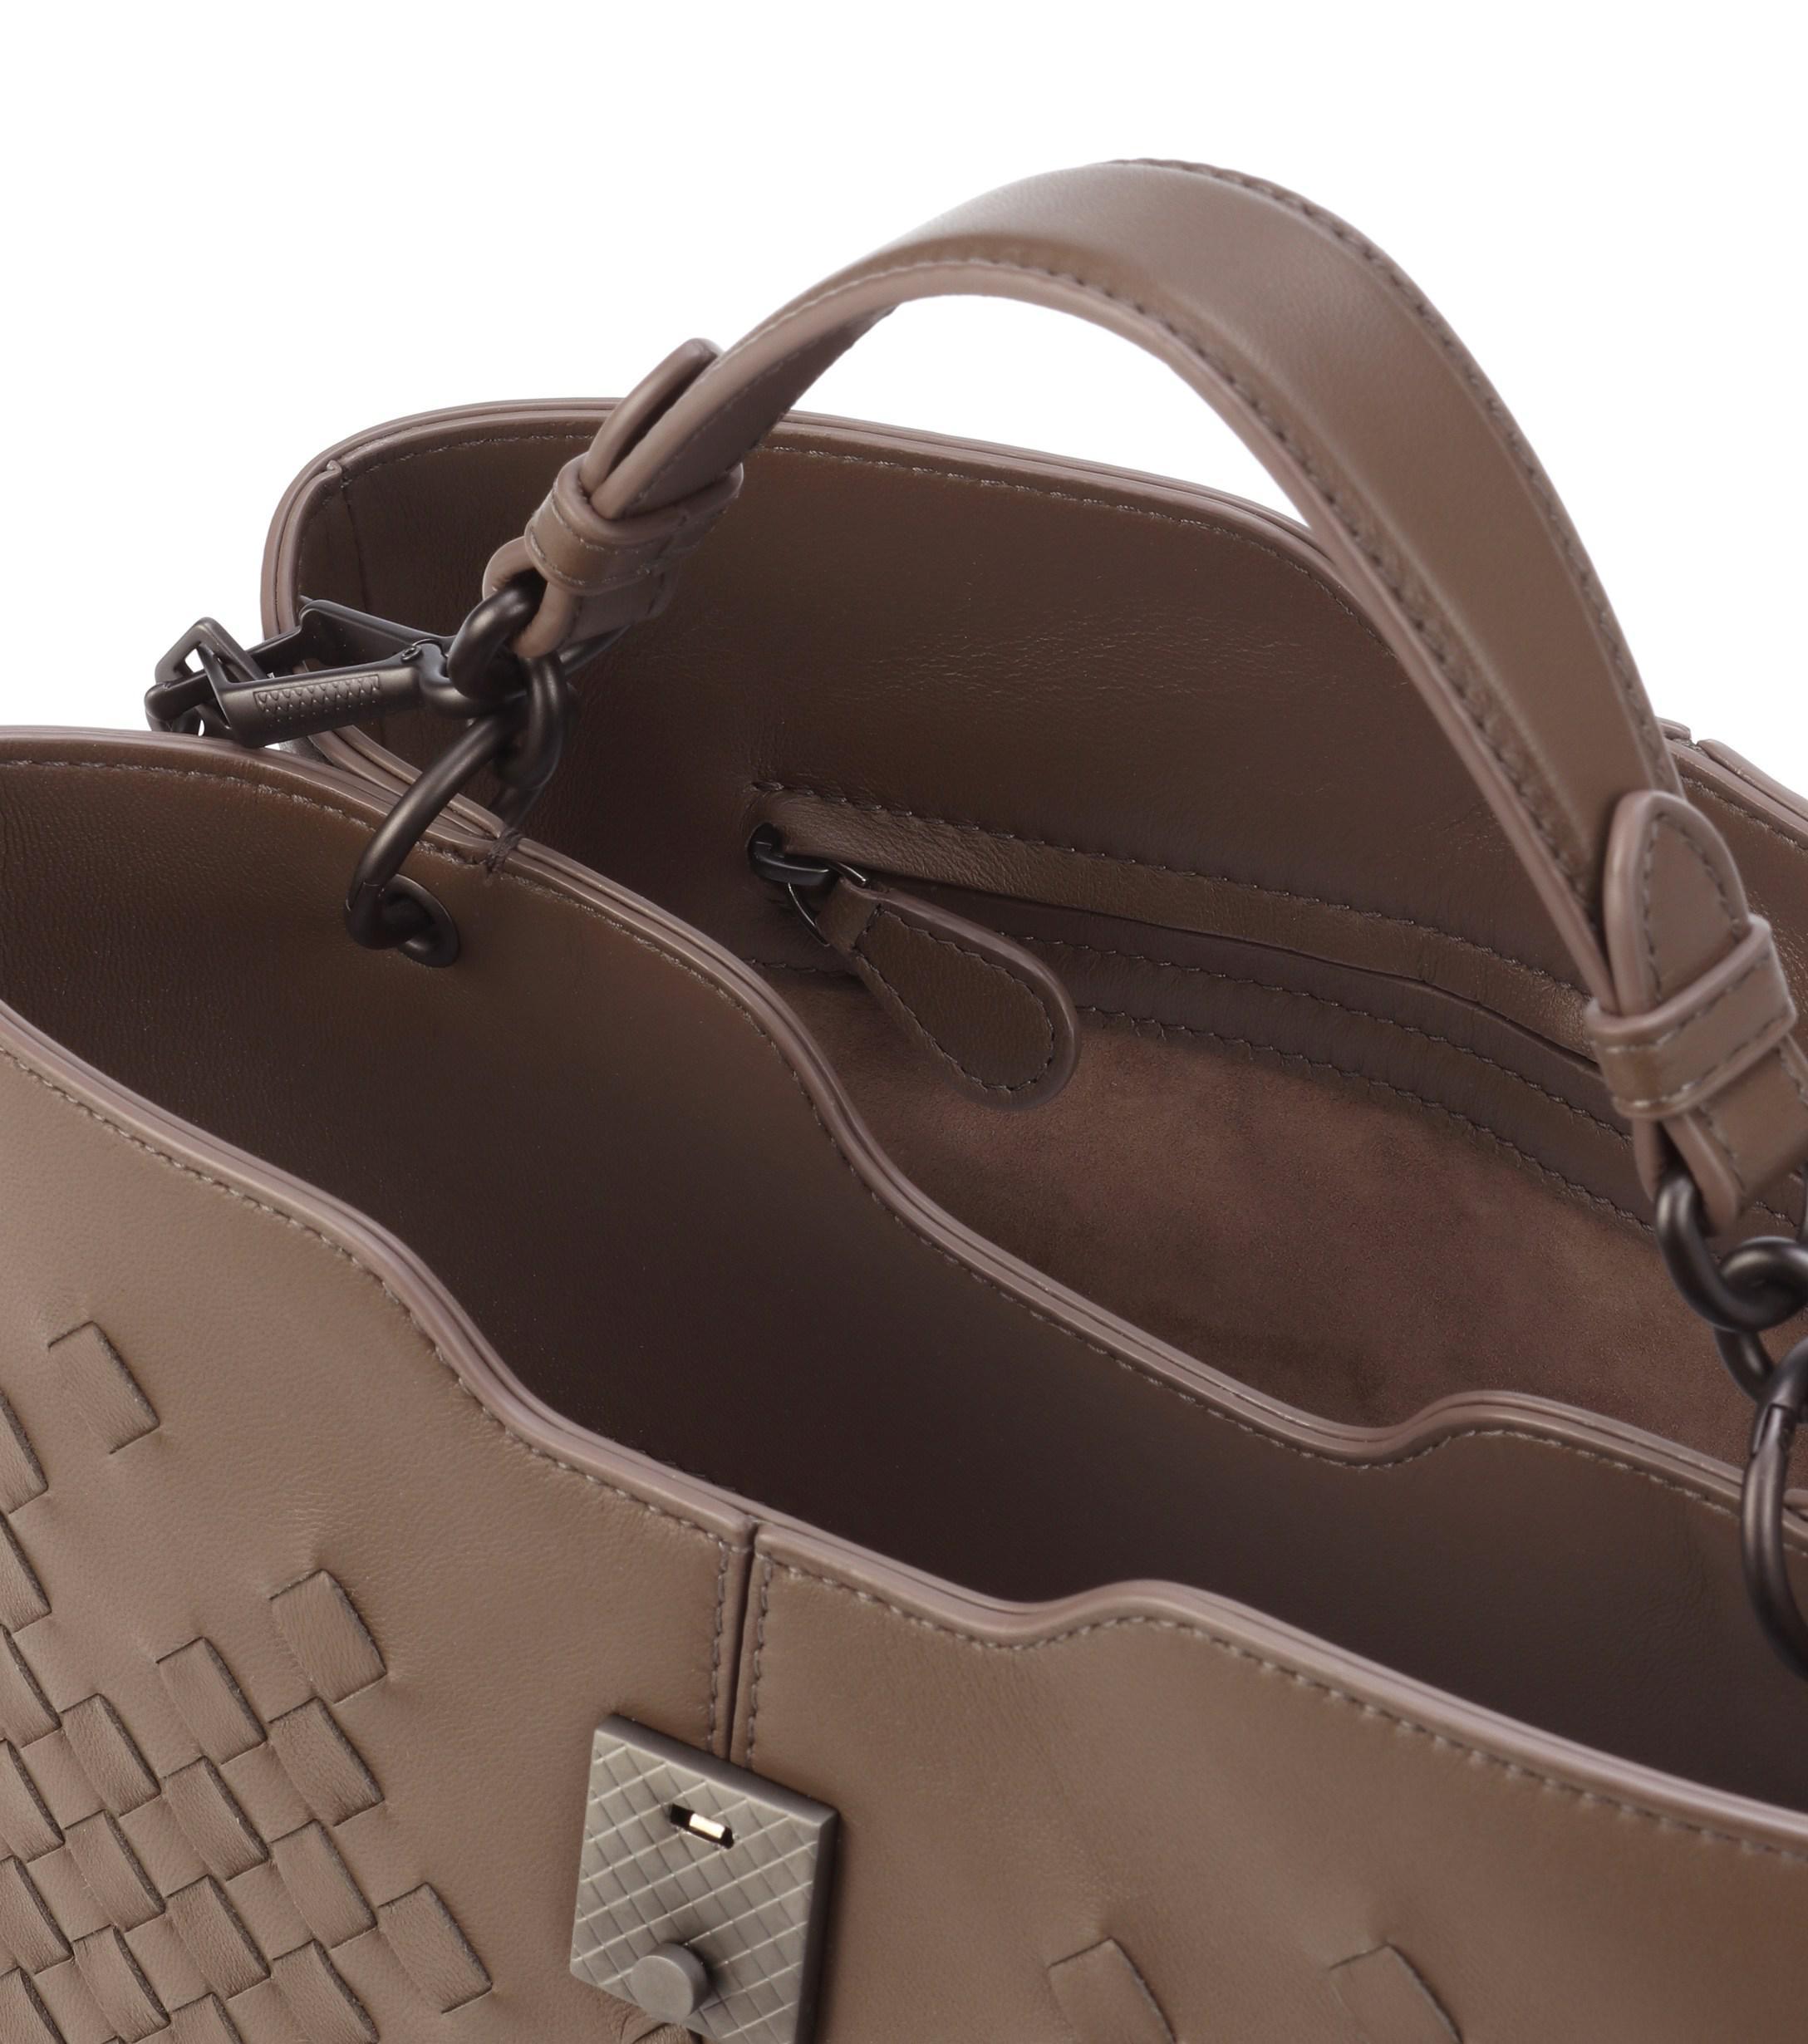 4d757c3036 Lyst - Bottega Veneta Medium Napoli Leather Shoulder Bag in Brown